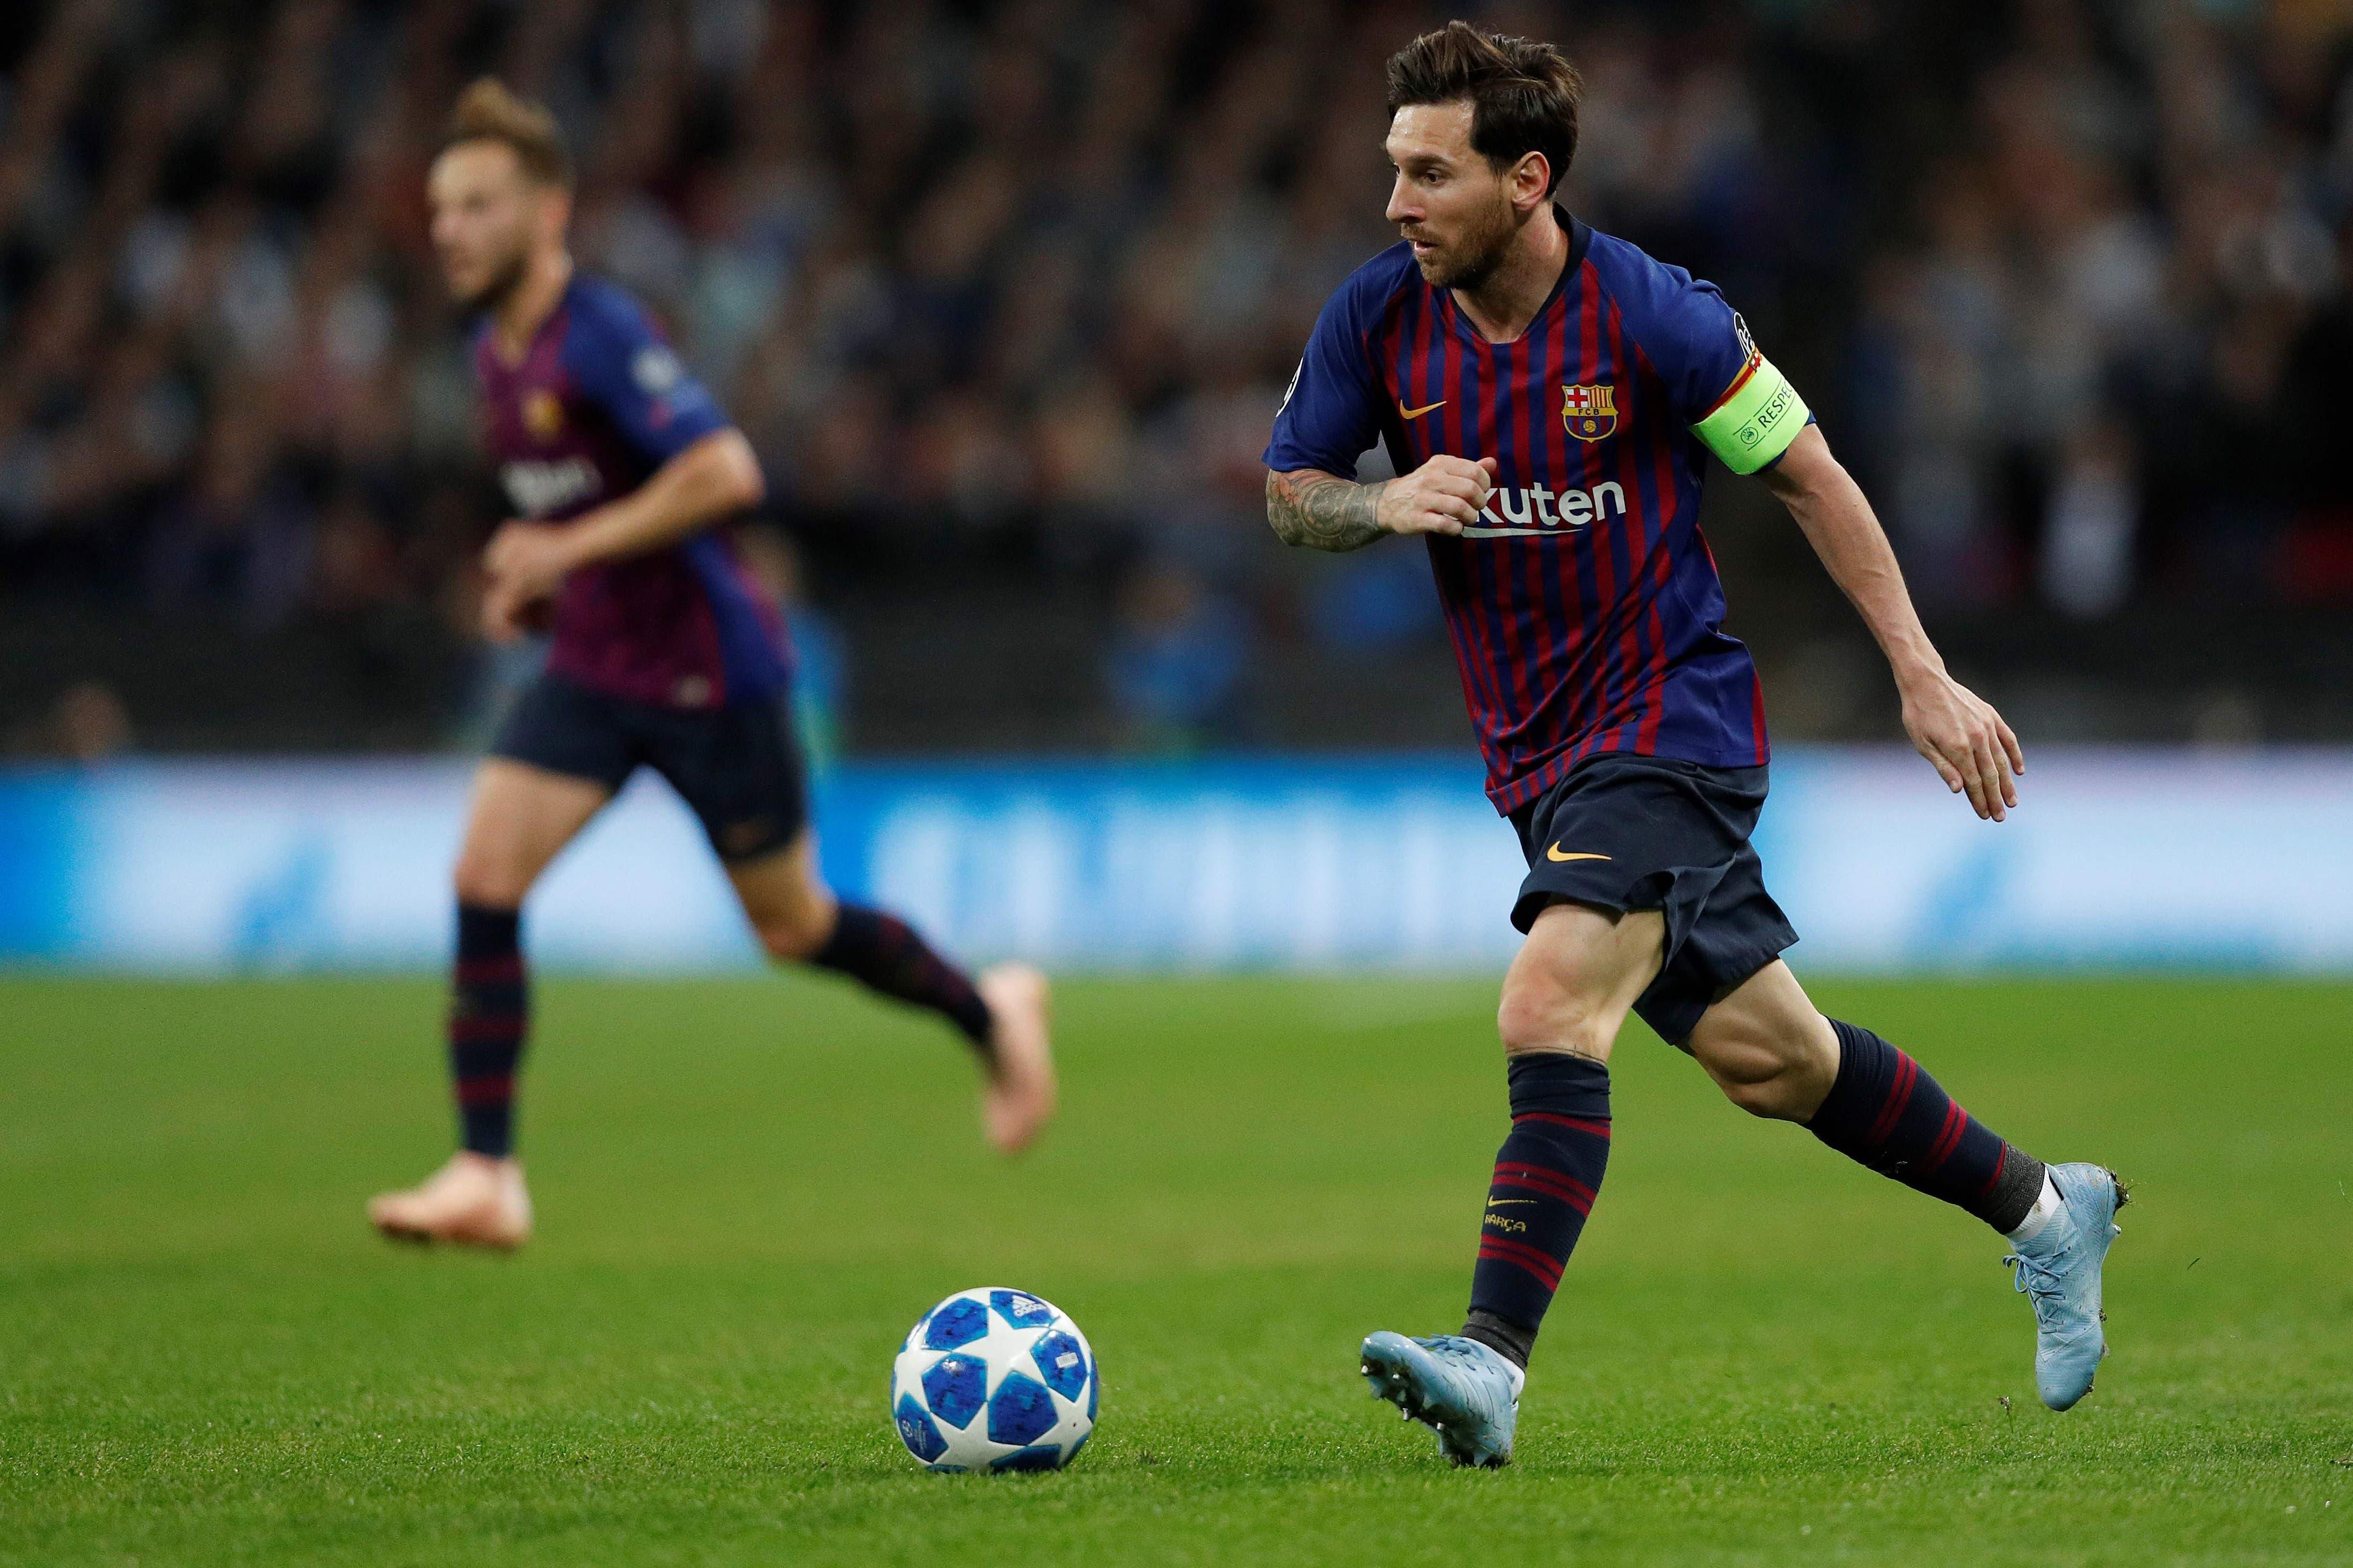 Valencia-Barcelona, liga de España: horario y TV